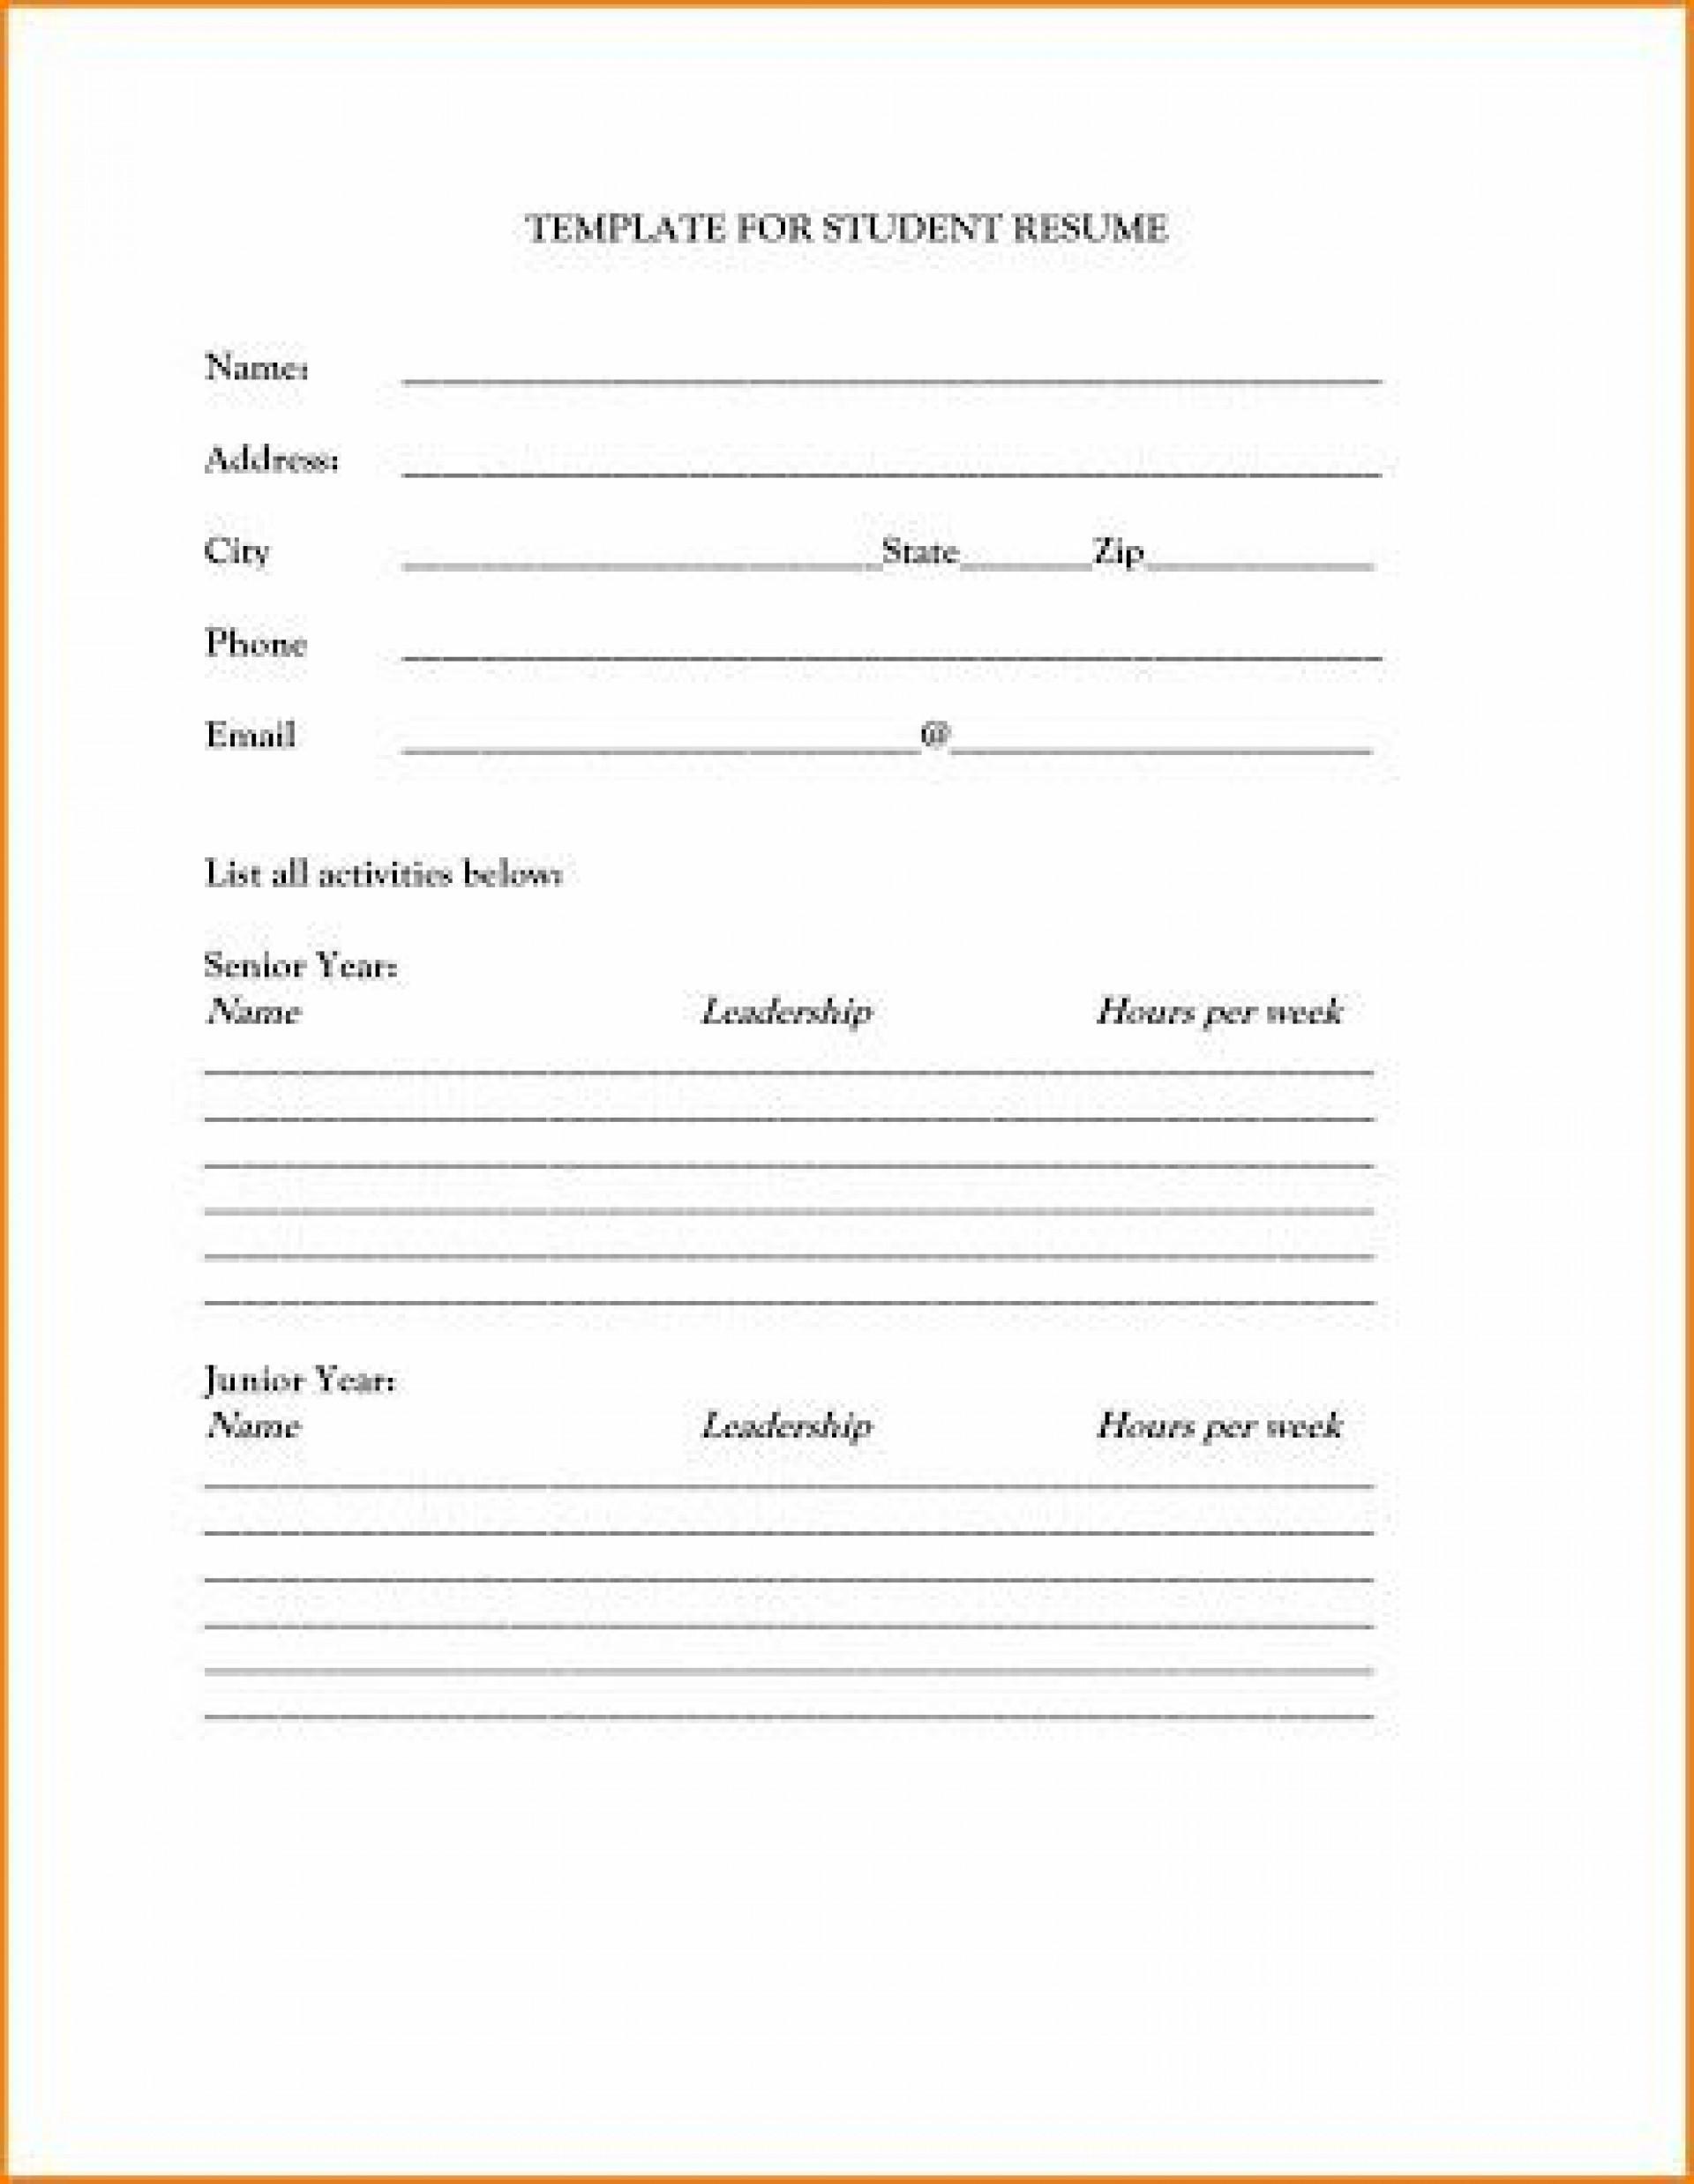 009 Singular Free Basic Blank Resume Template Sample  Templates Word Printable To Print1920